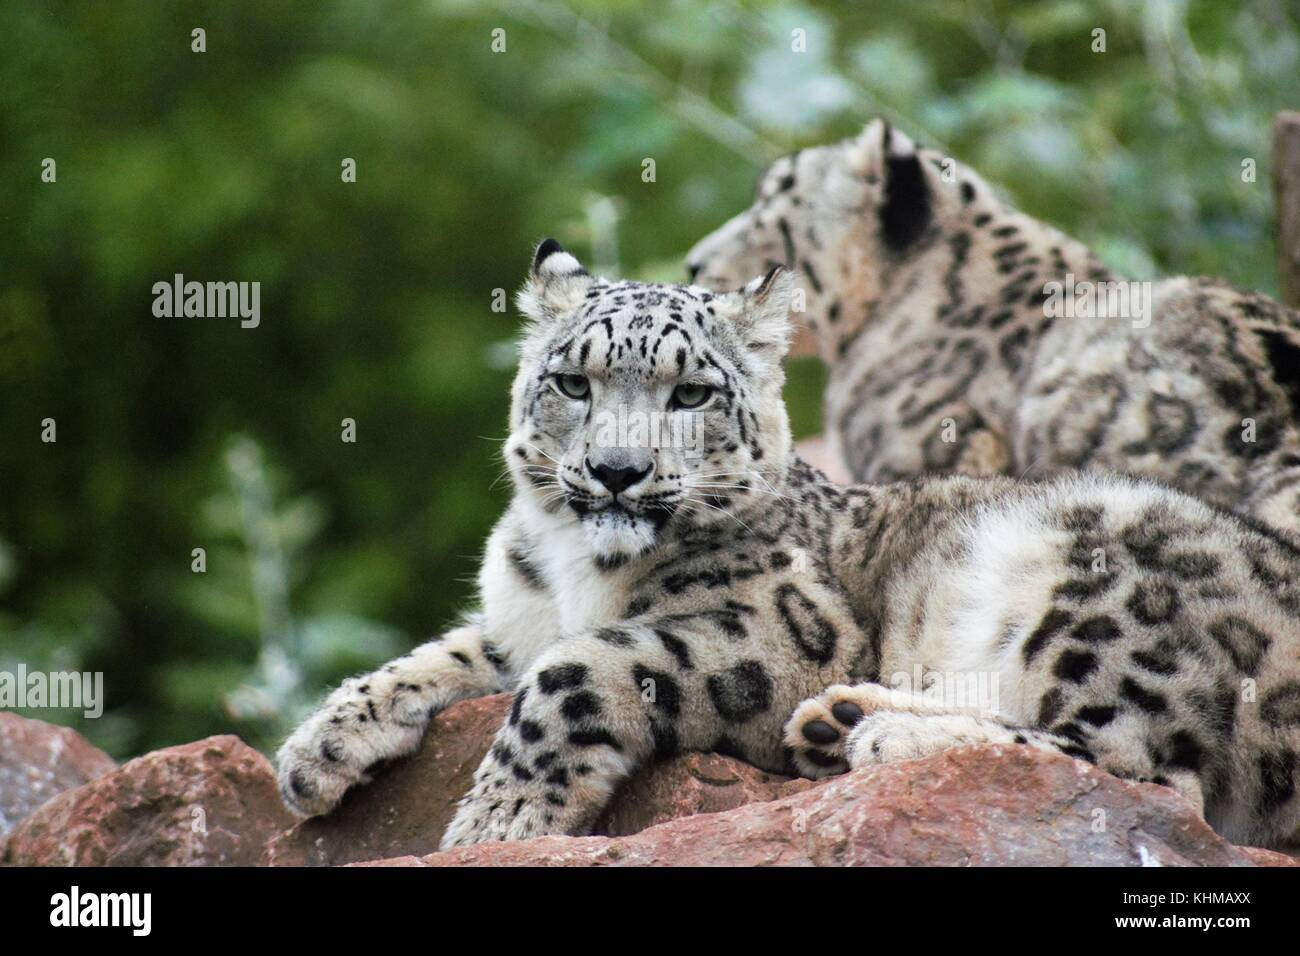 Snow Leopards - Stock Image